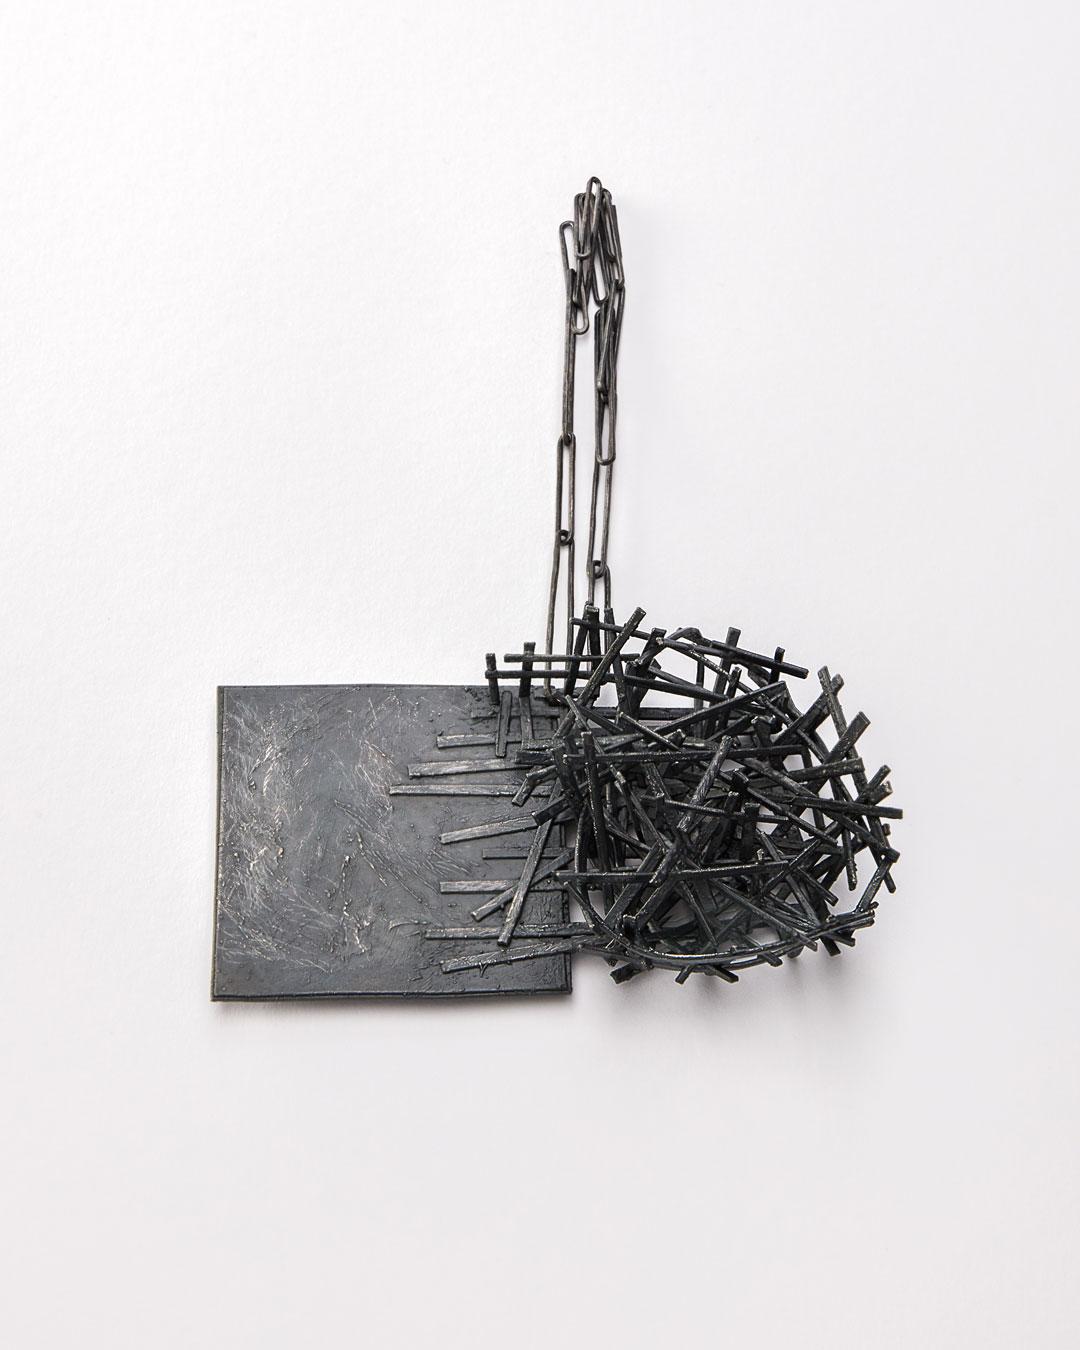 Iris Bodemer, Gegenüberstellung 1 (Juxtapositie 1), 2019, hanger; zilver, thermoplast, 90 x 140 x 40 mm, €4250